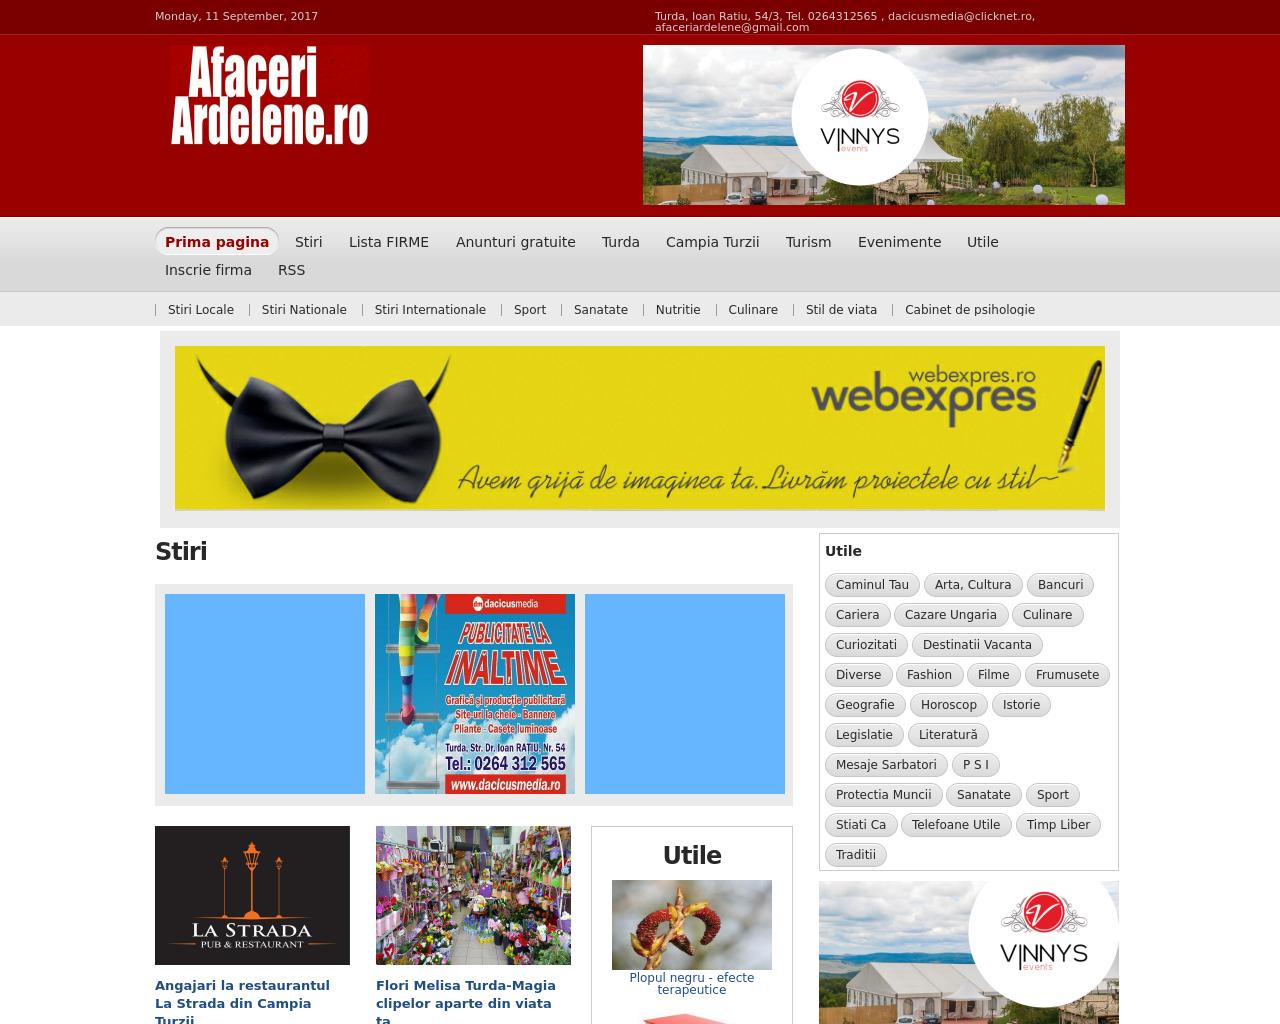 AfaceriArdelene.ro-Advertising-Reviews-Pricing